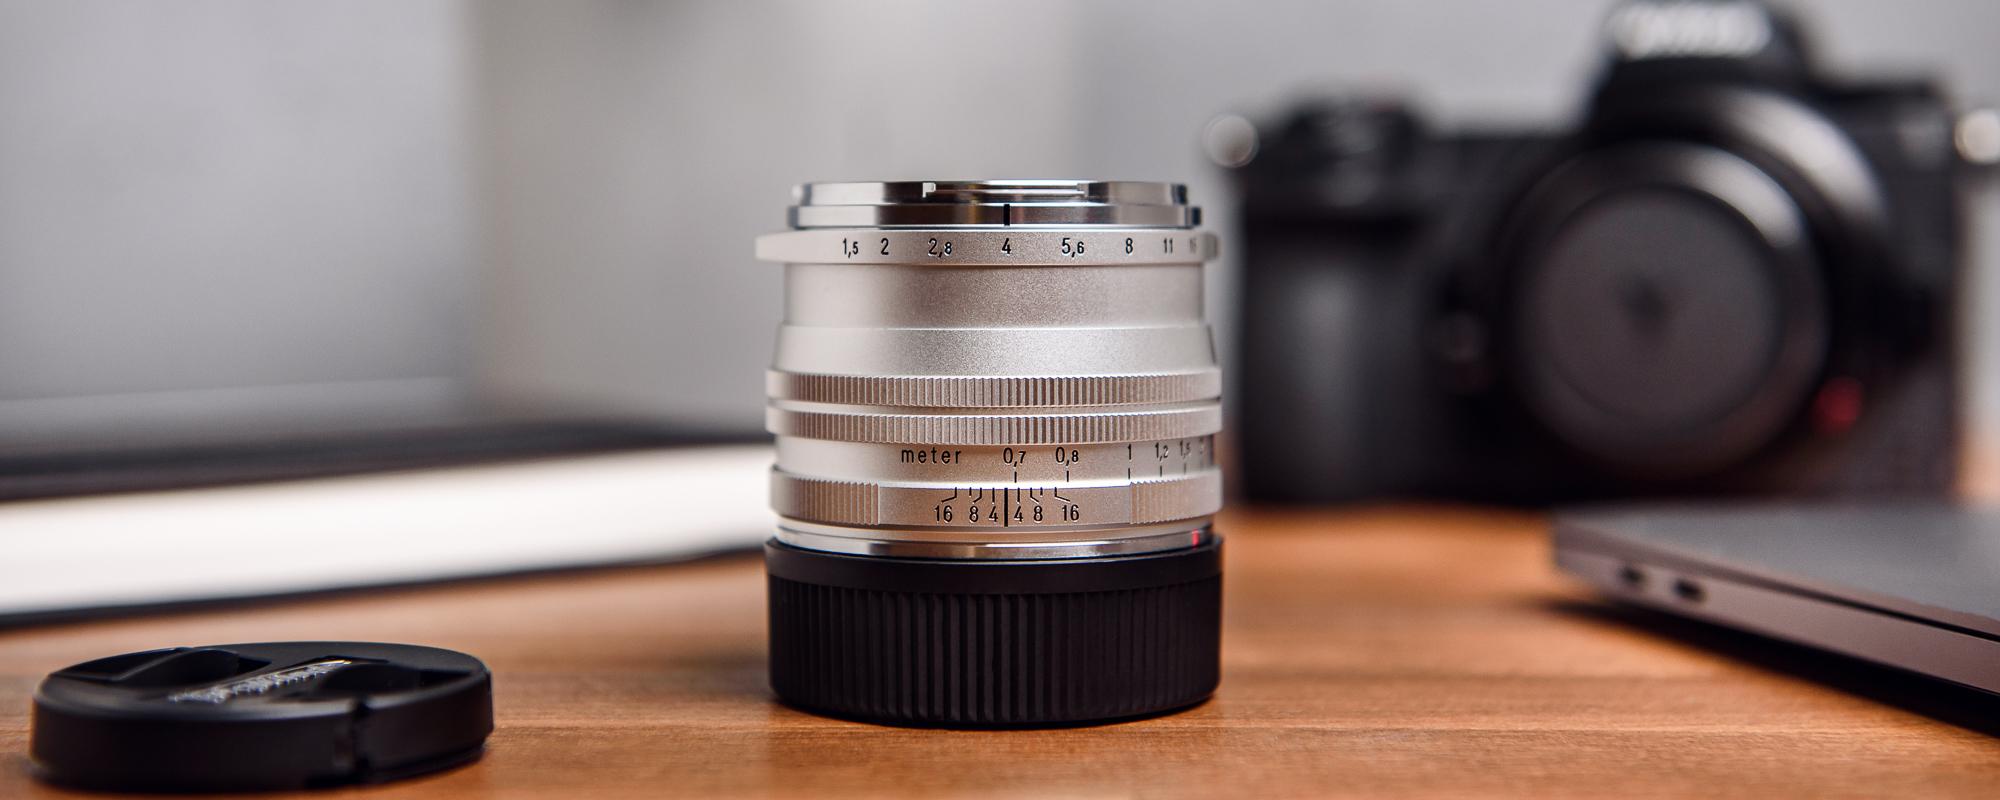 Voigtlander Nokton II 50 mm f/1.5 lens for Leica M - MC, silver - on desk